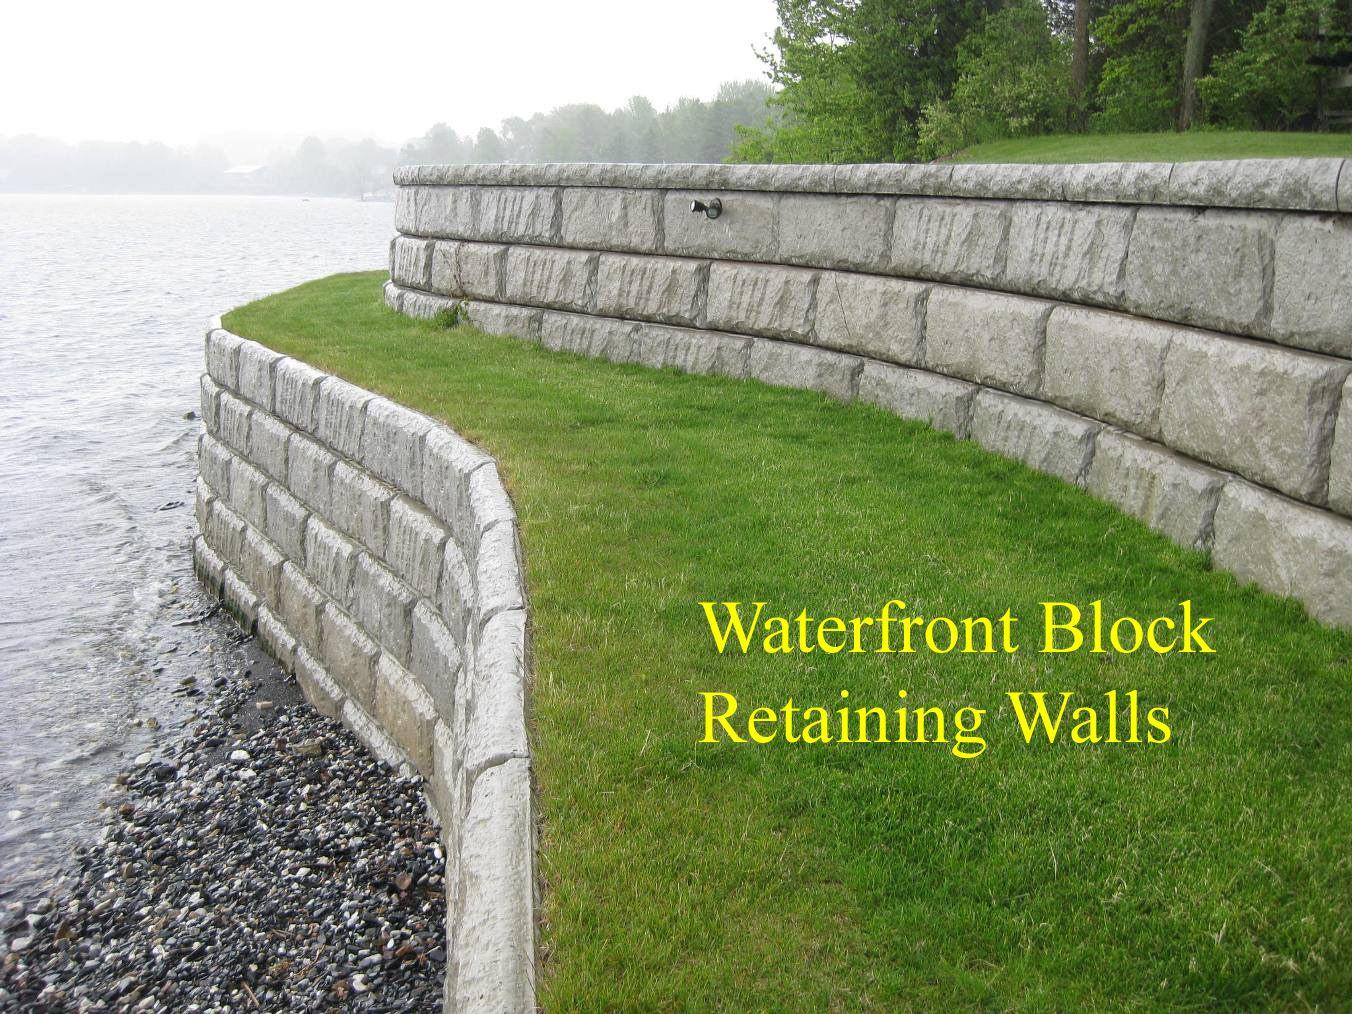 lake sea walls | Retaining Walls, Waterfront, & Marine ...